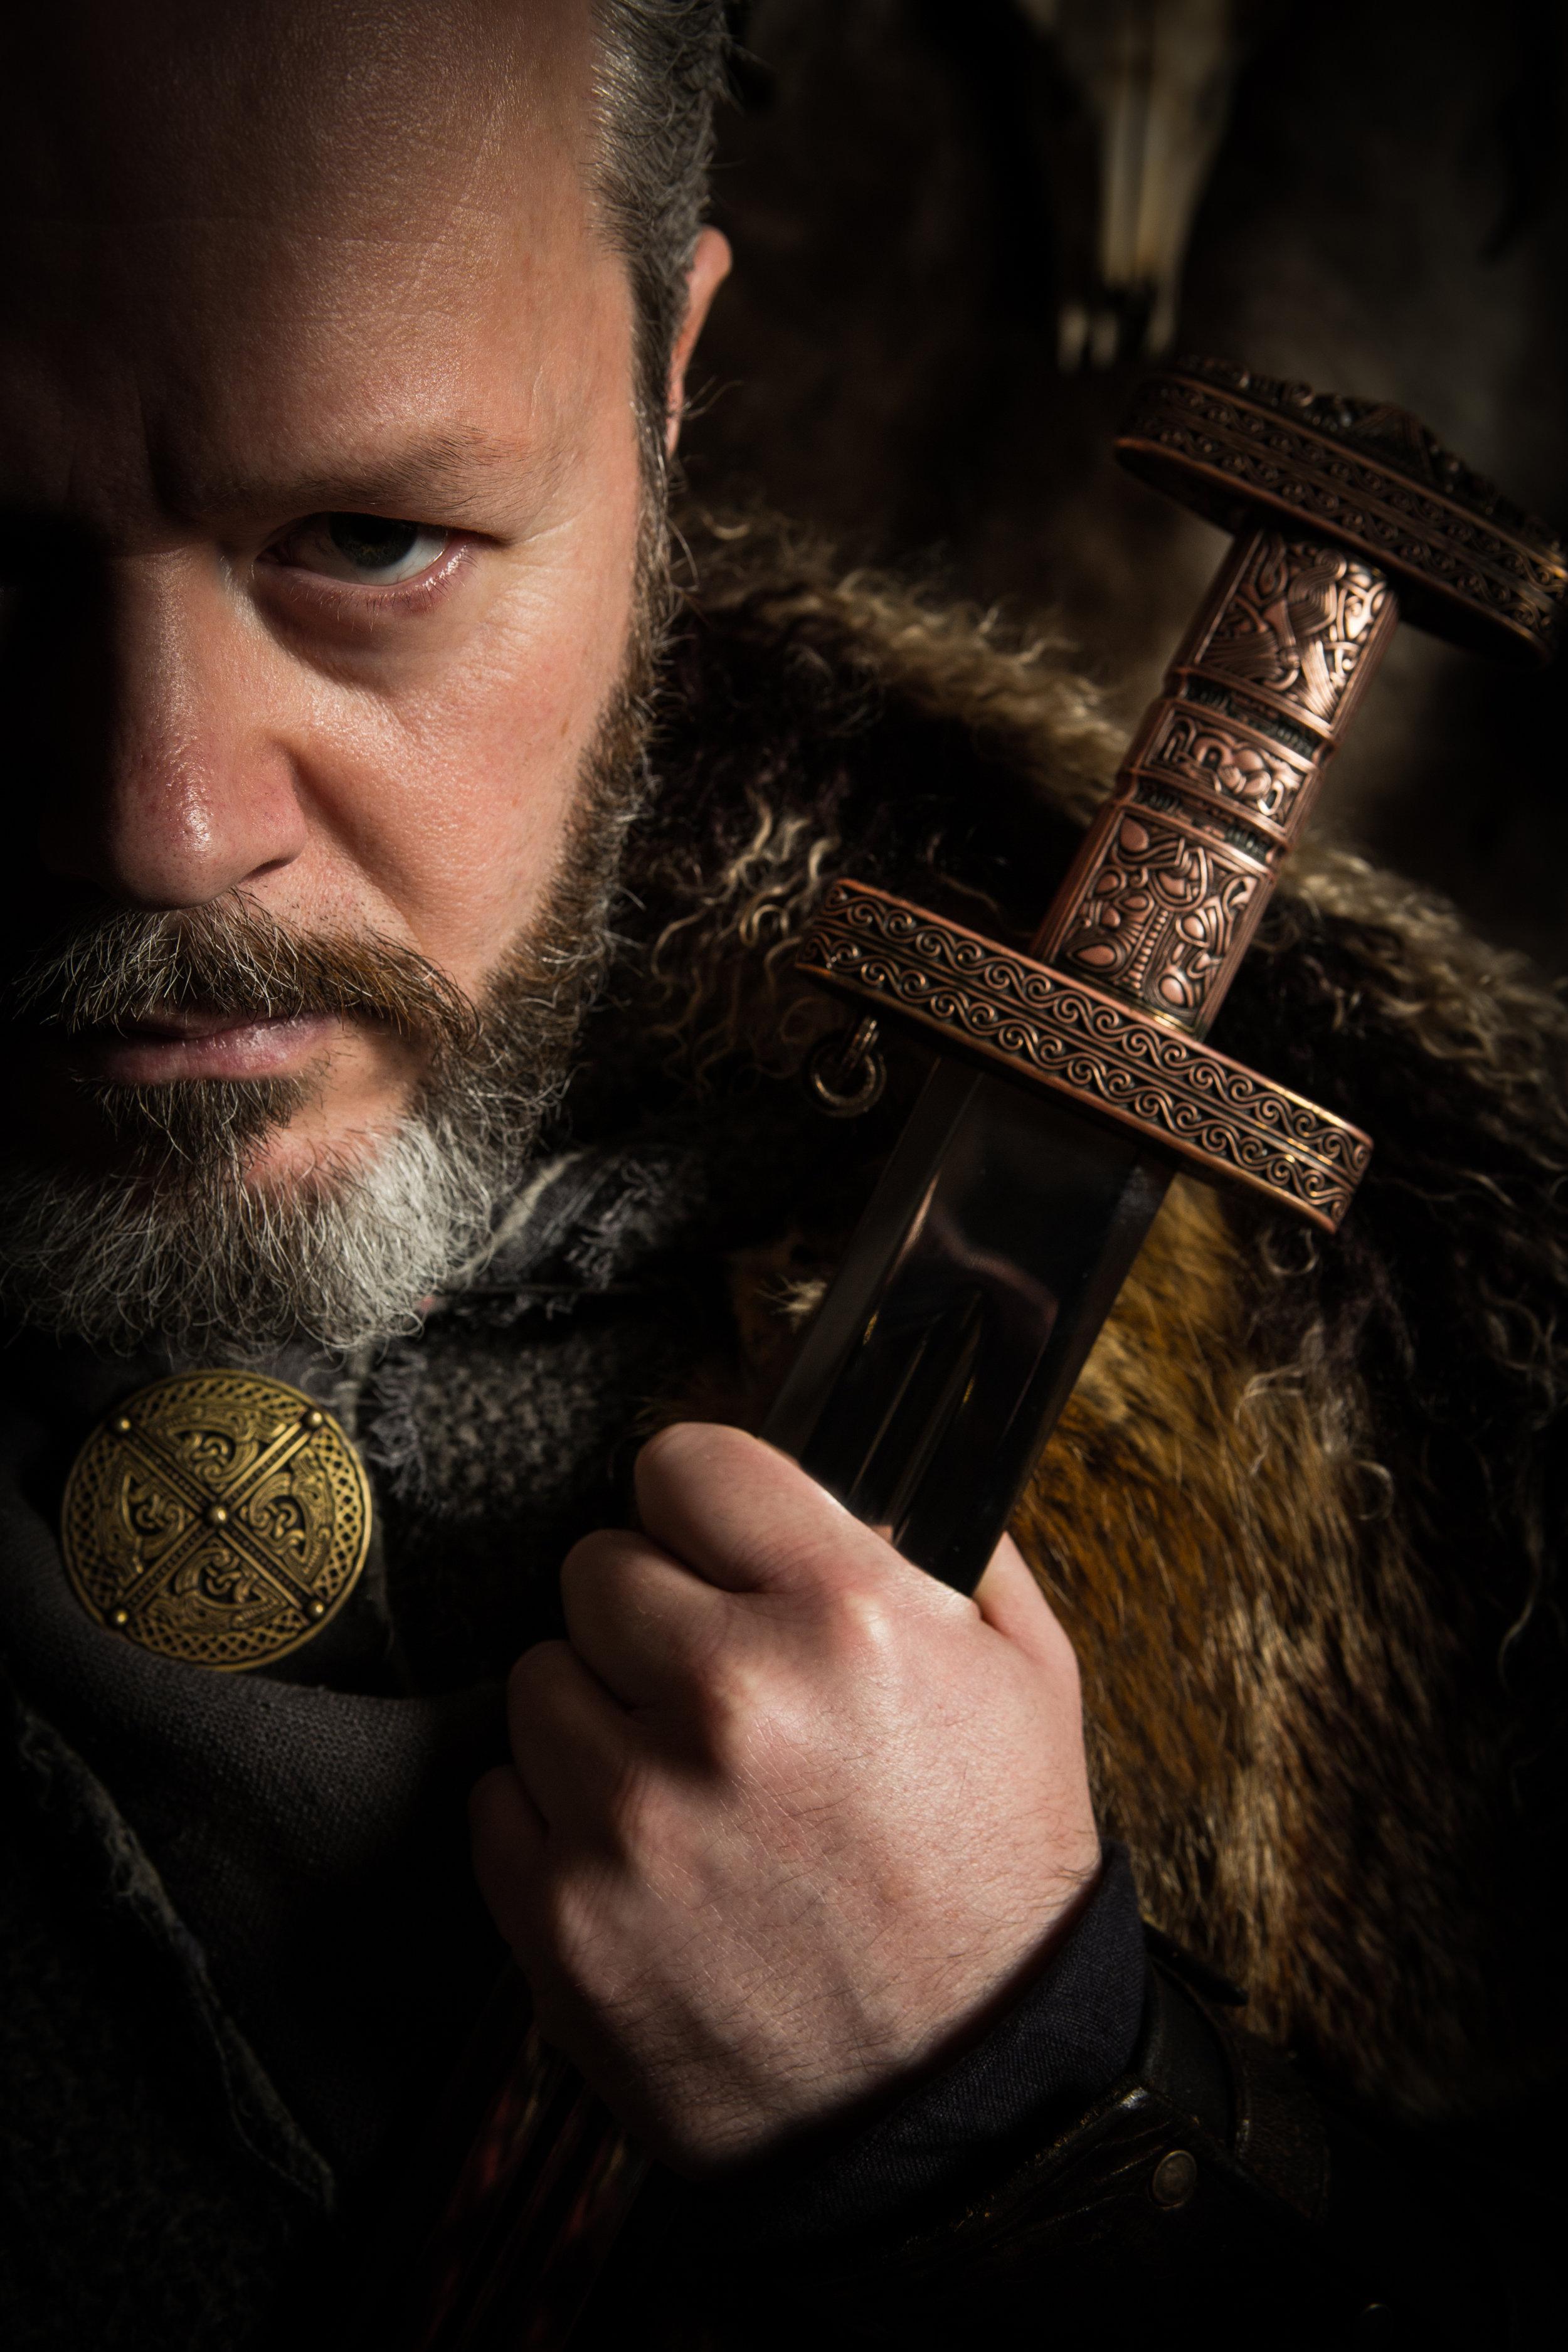 Photo credit: MINK Viking Portrait